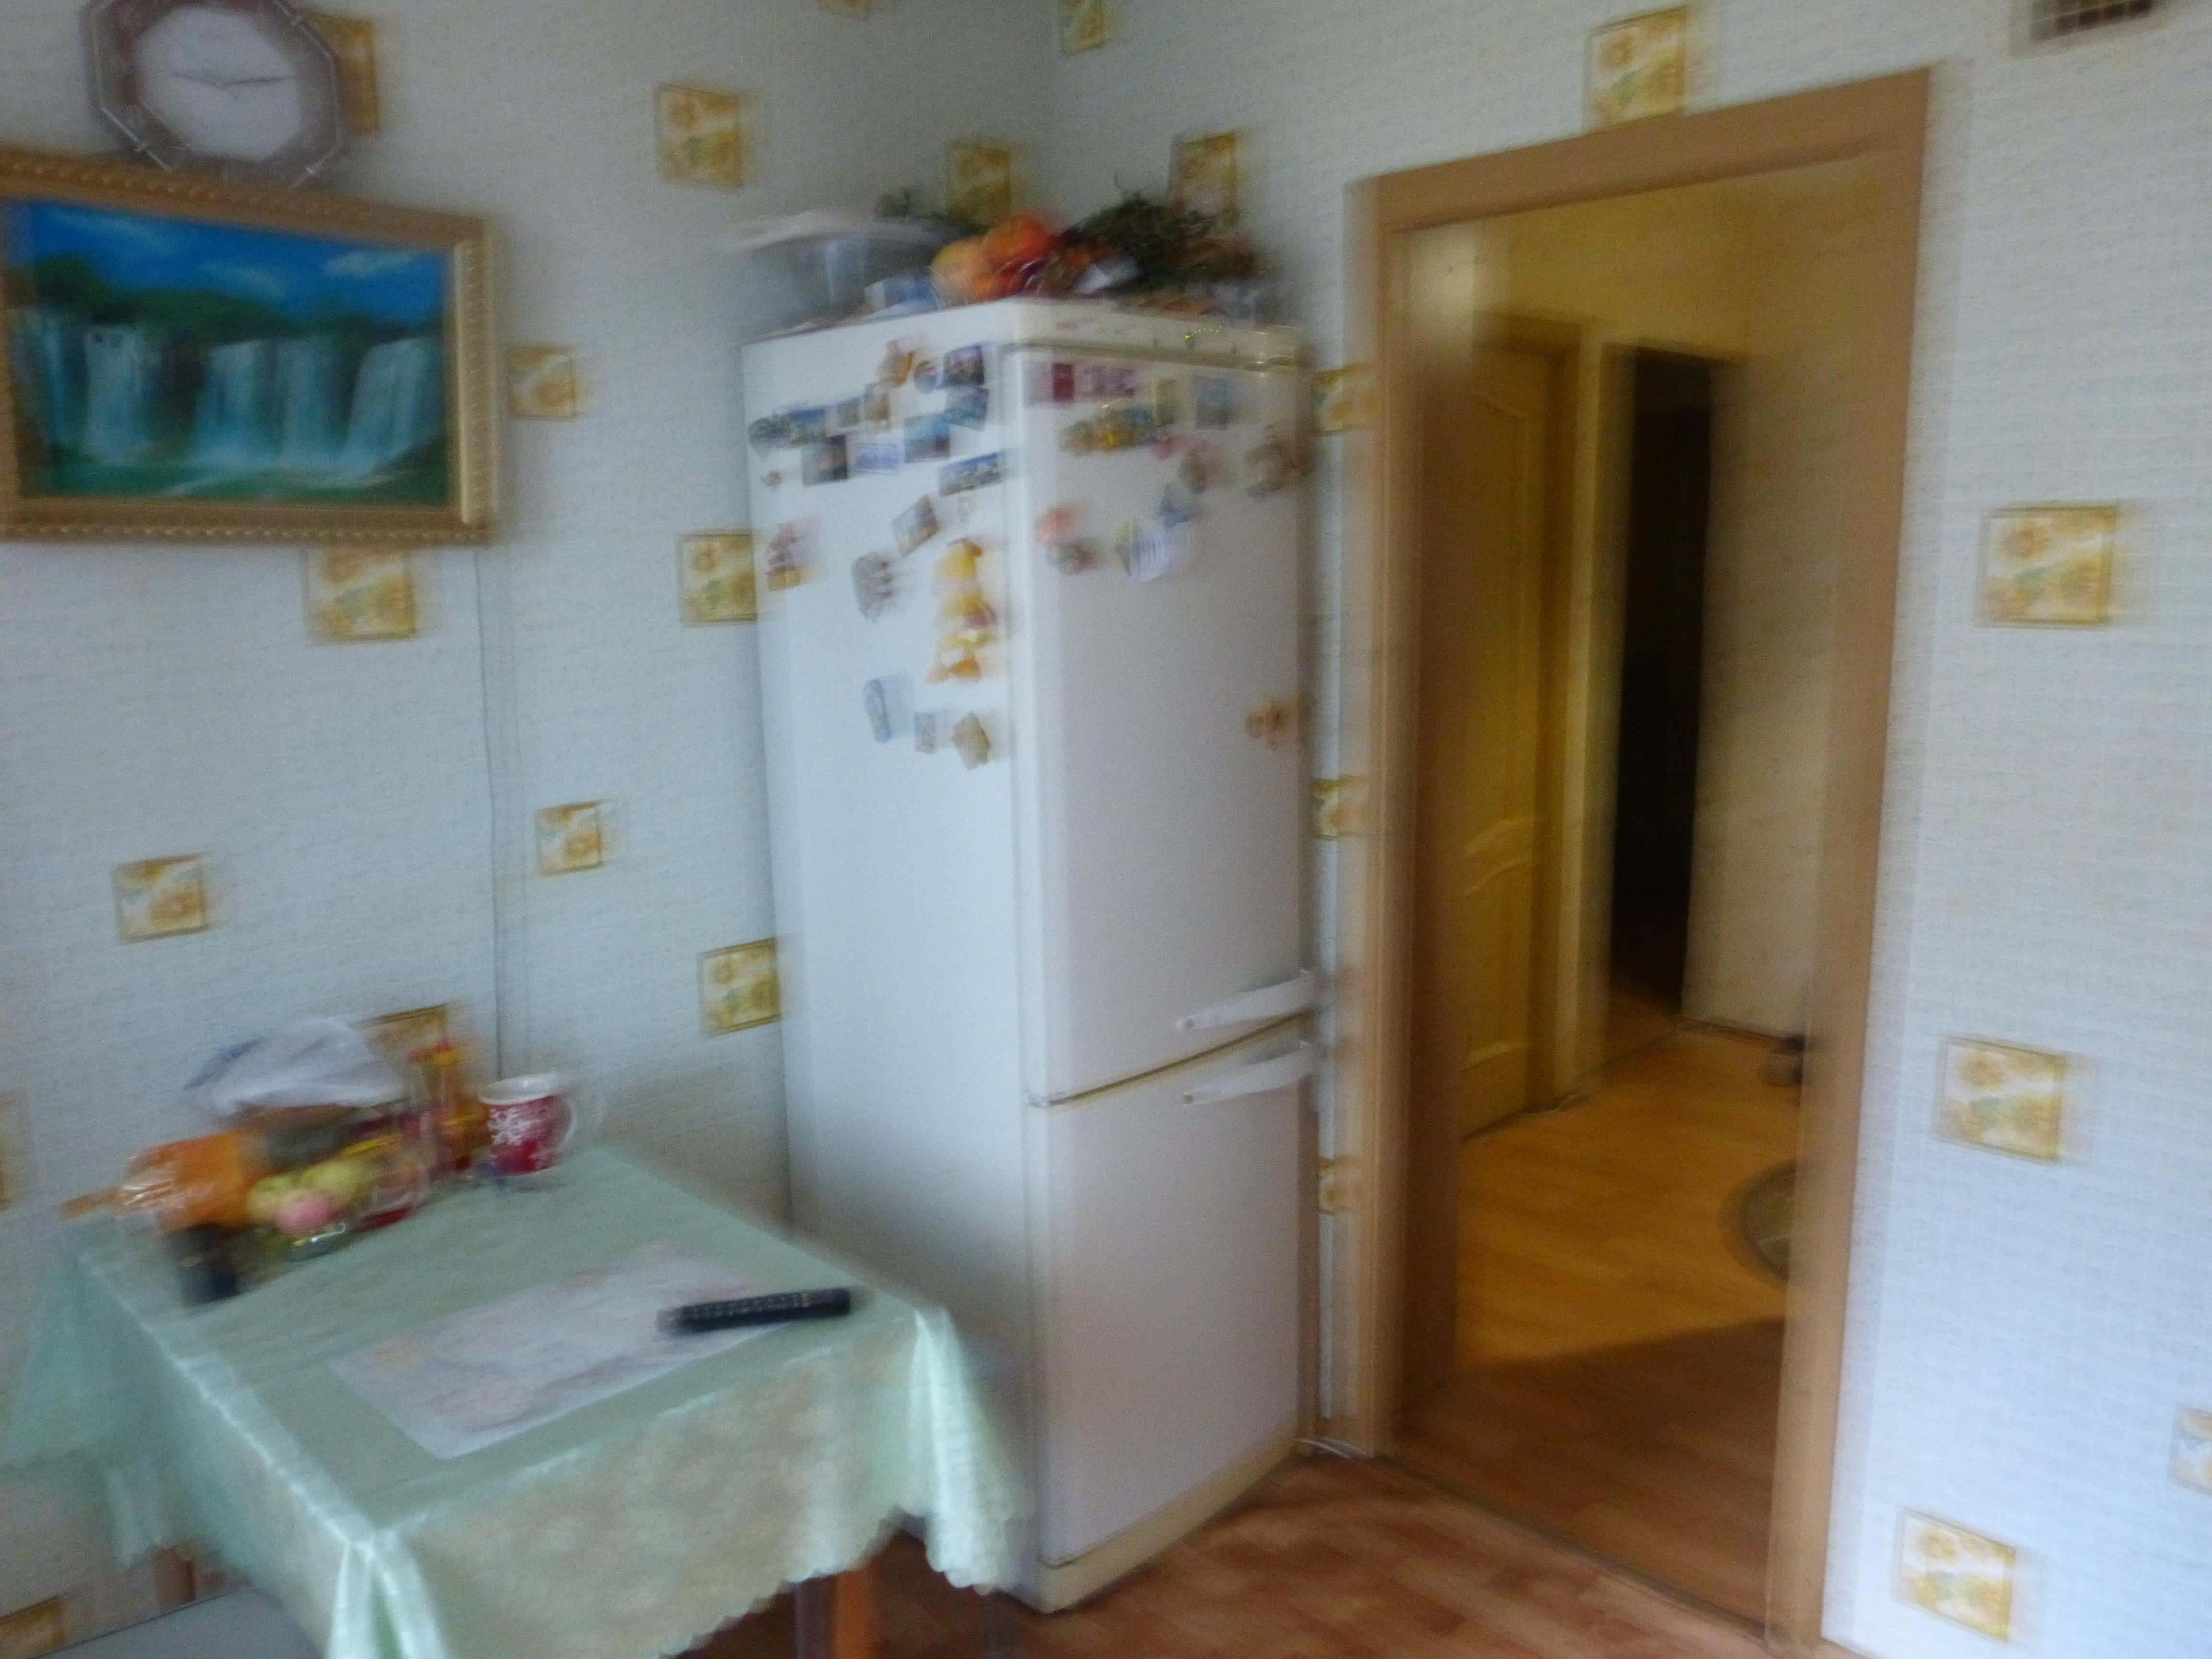 Комната 15 кв.м в 3 к.кв. ул. Печорская, д. 5